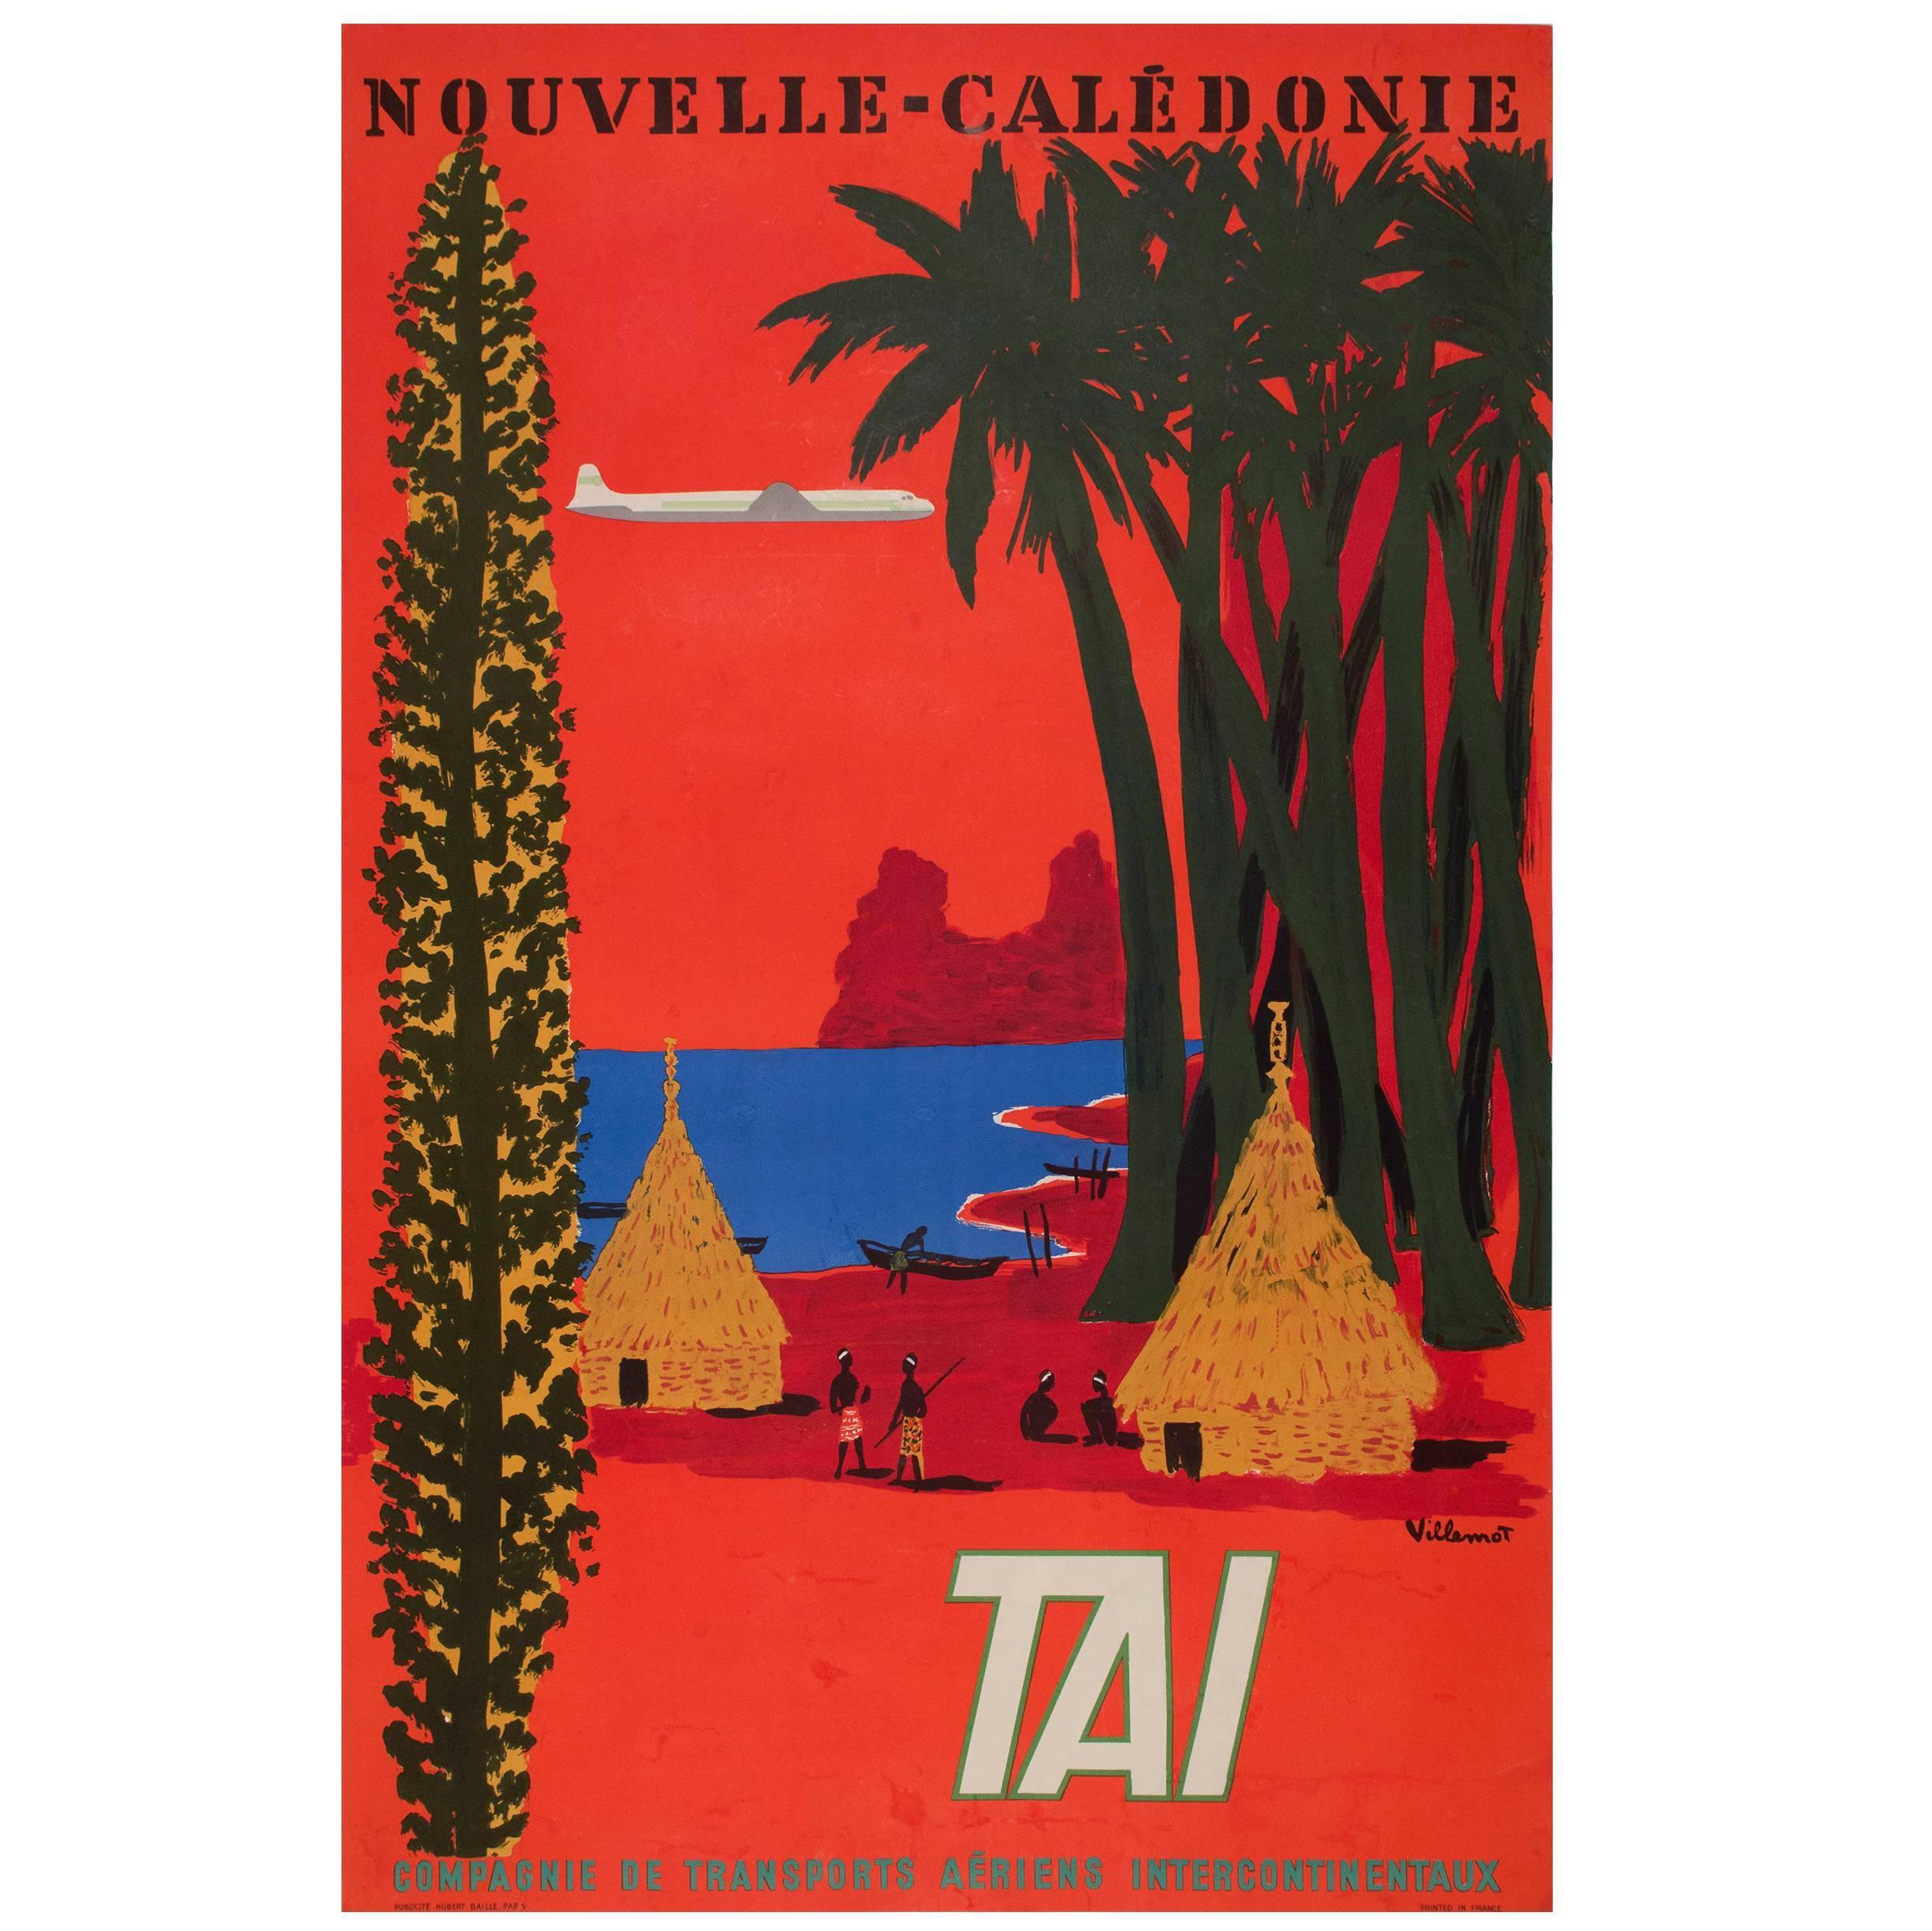 Original 1950s Vintage Airline Poster by Bernard Villemot for TAI